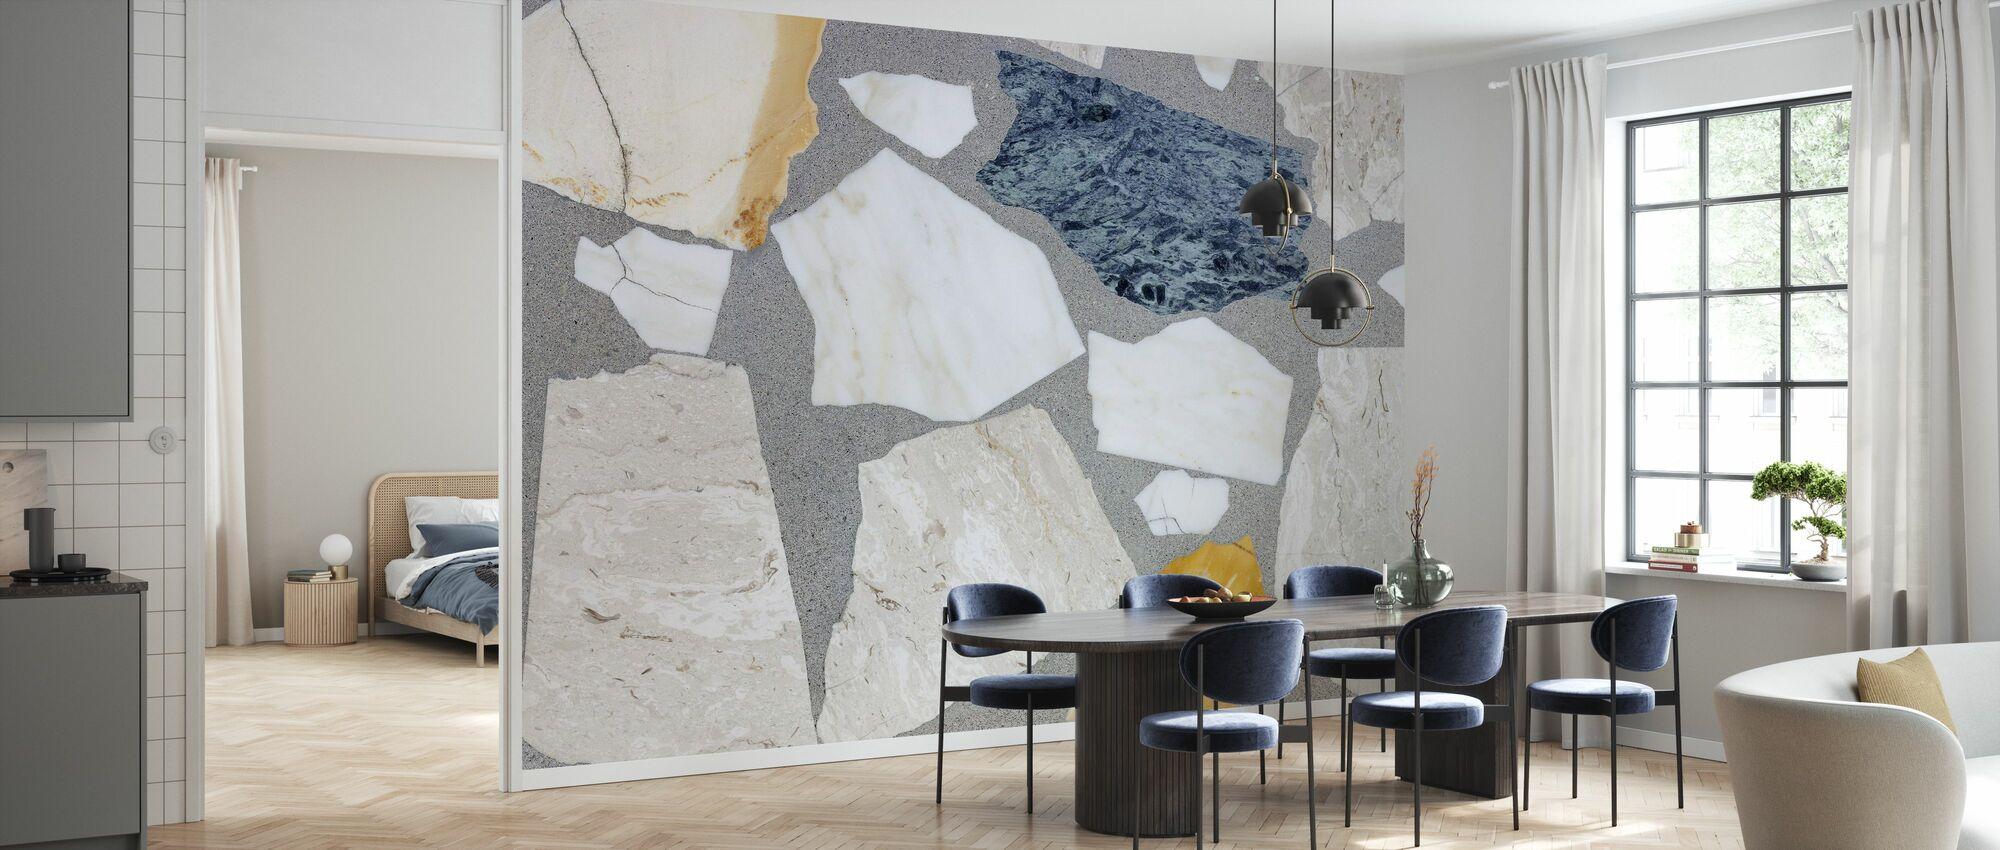 Mixed Terrazzo - Wallpaper - Kitchen